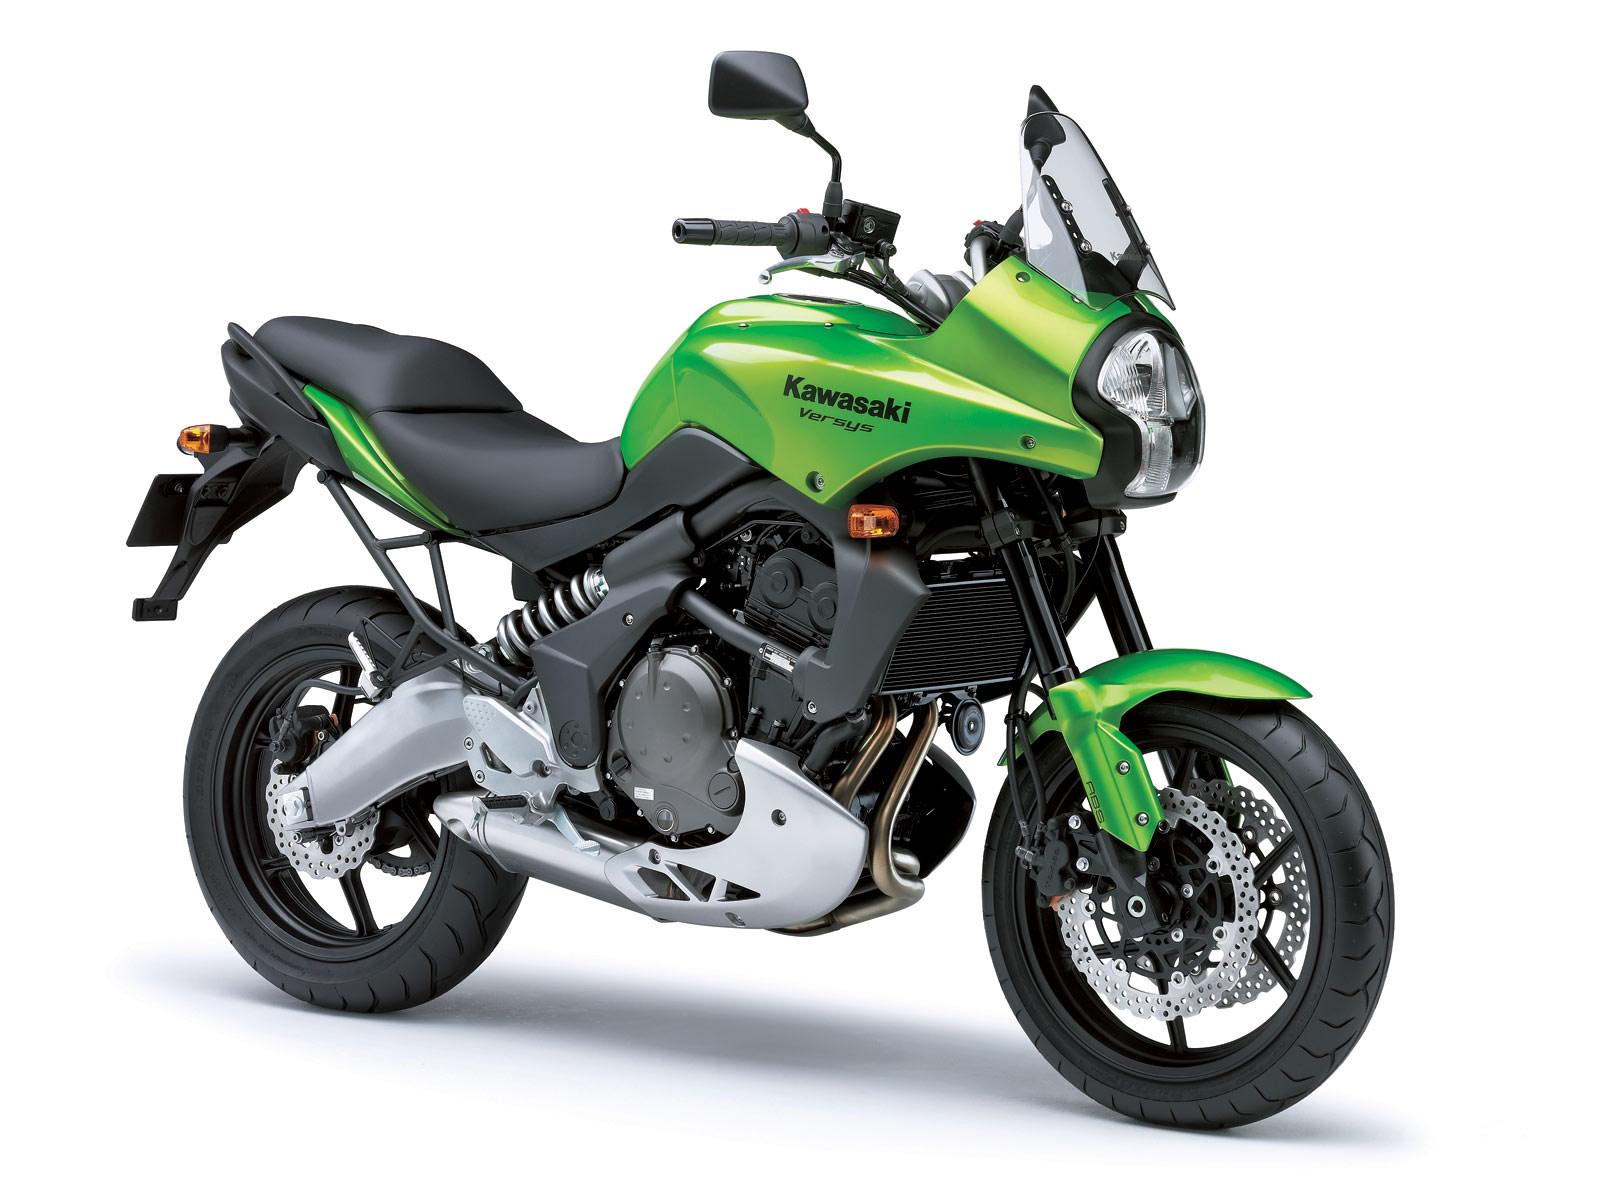 motorcycle big bike 2008 kawasaki versys abs. Black Bedroom Furniture Sets. Home Design Ideas